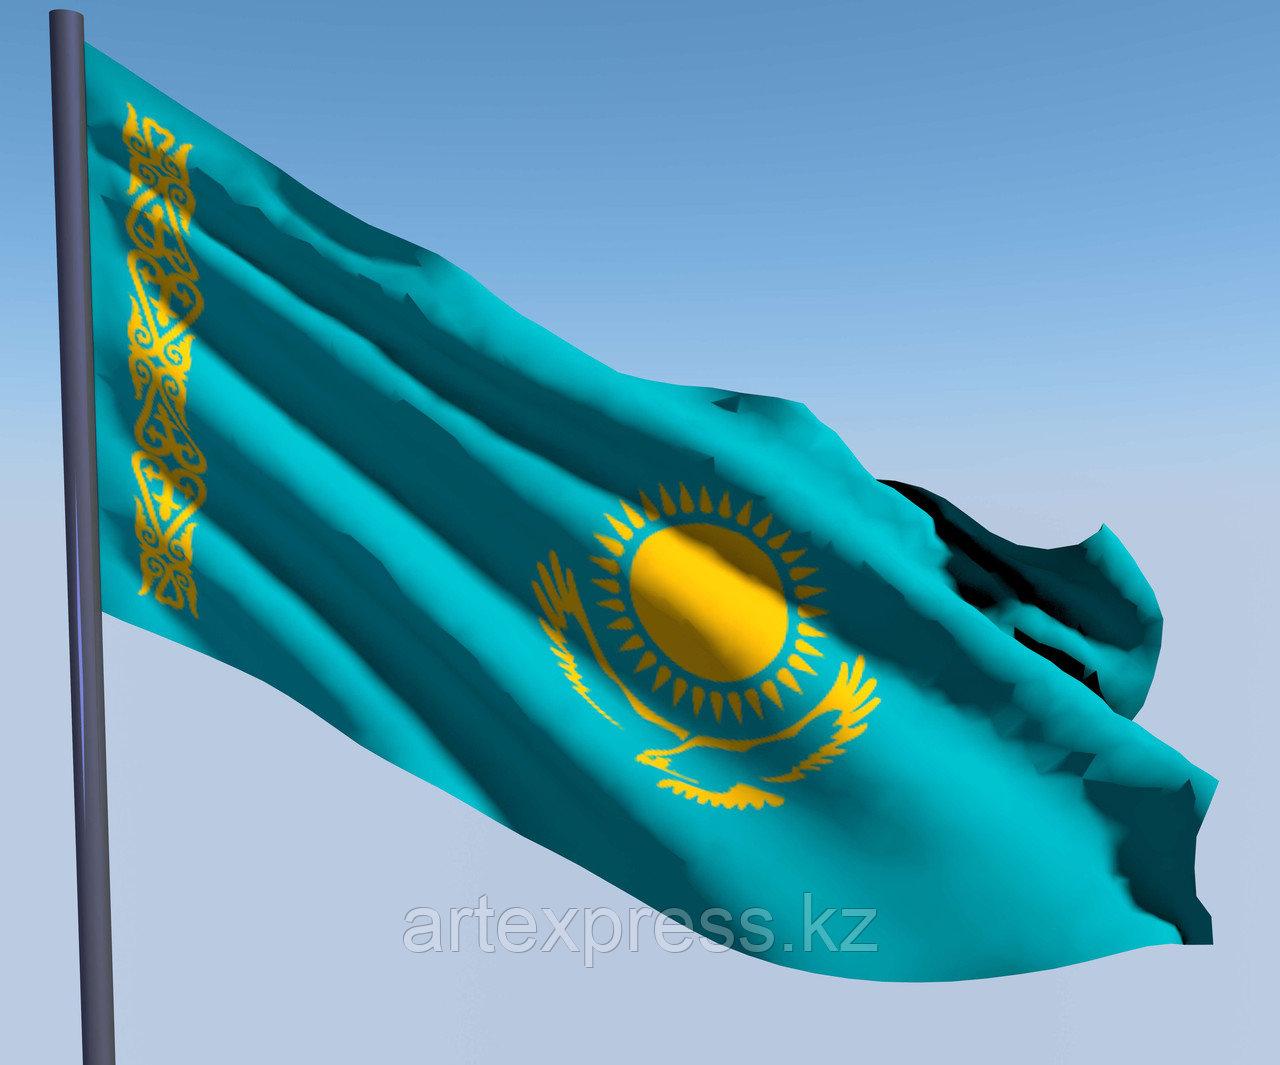 Флаг РК, 1 х 2м (двухслойный, с бахромой, габардин, компьютерная вышивка)